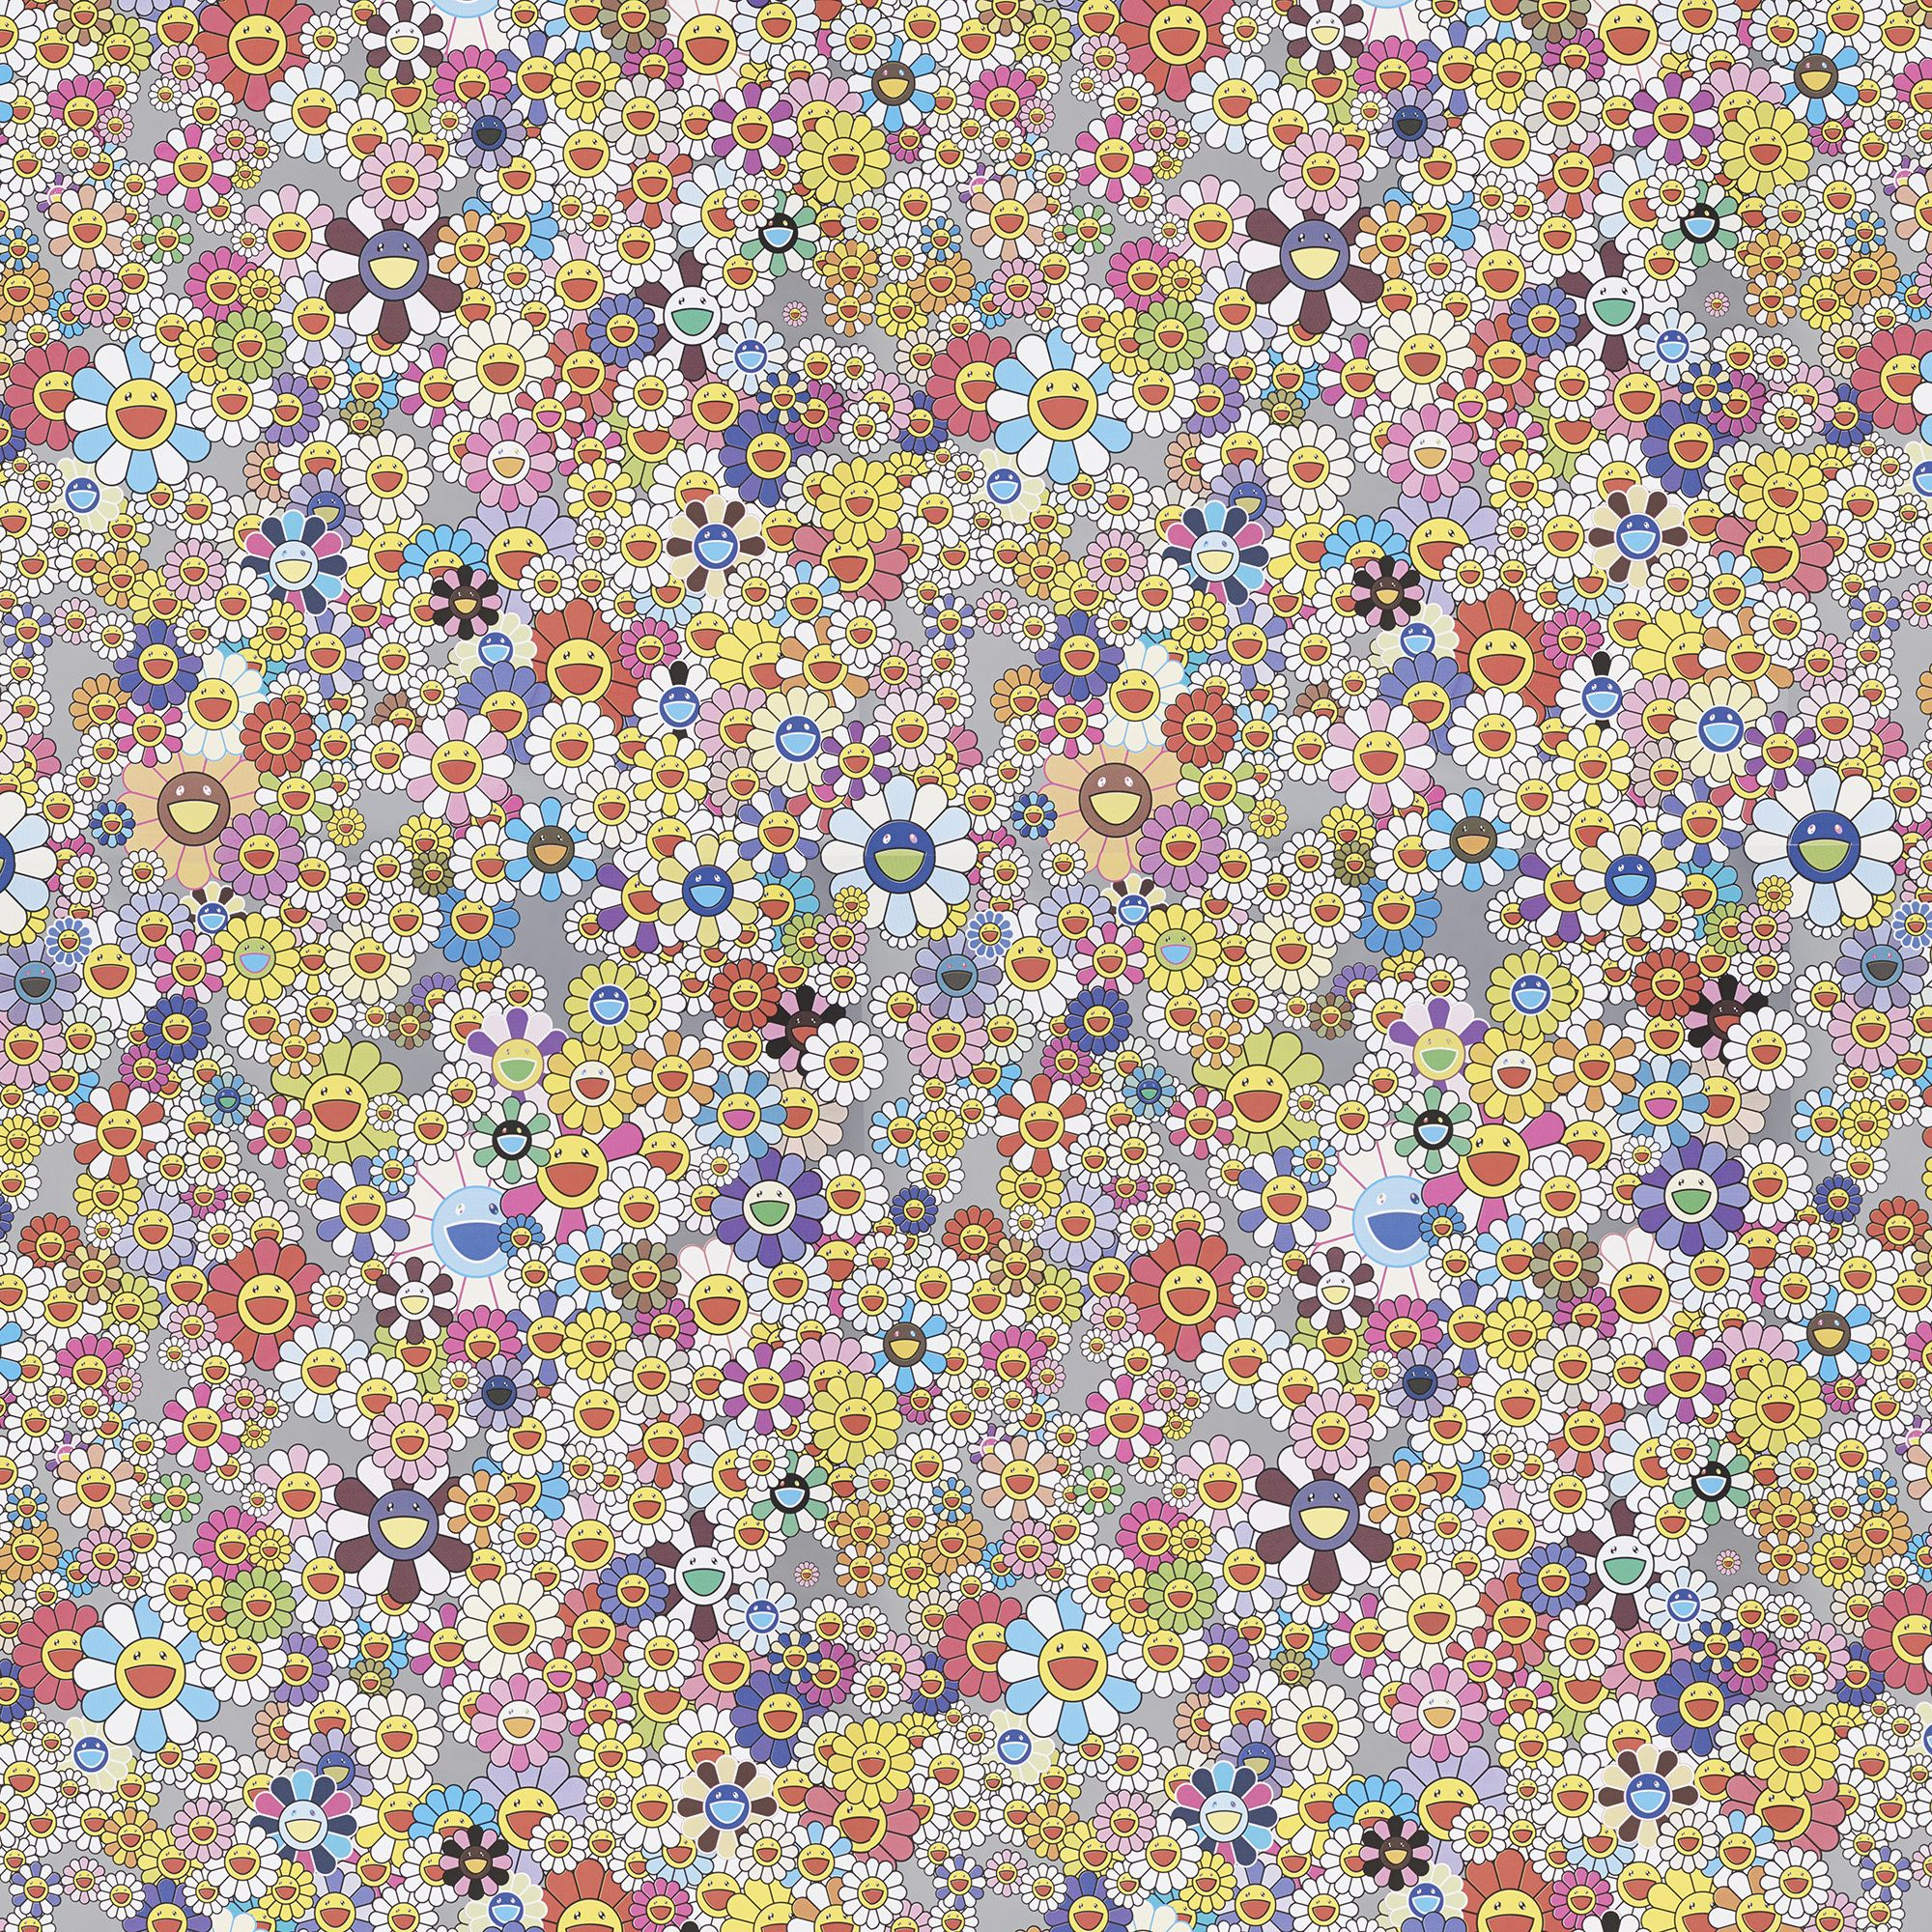 Takashi Murakami Wallpapers Wallpaper Cave